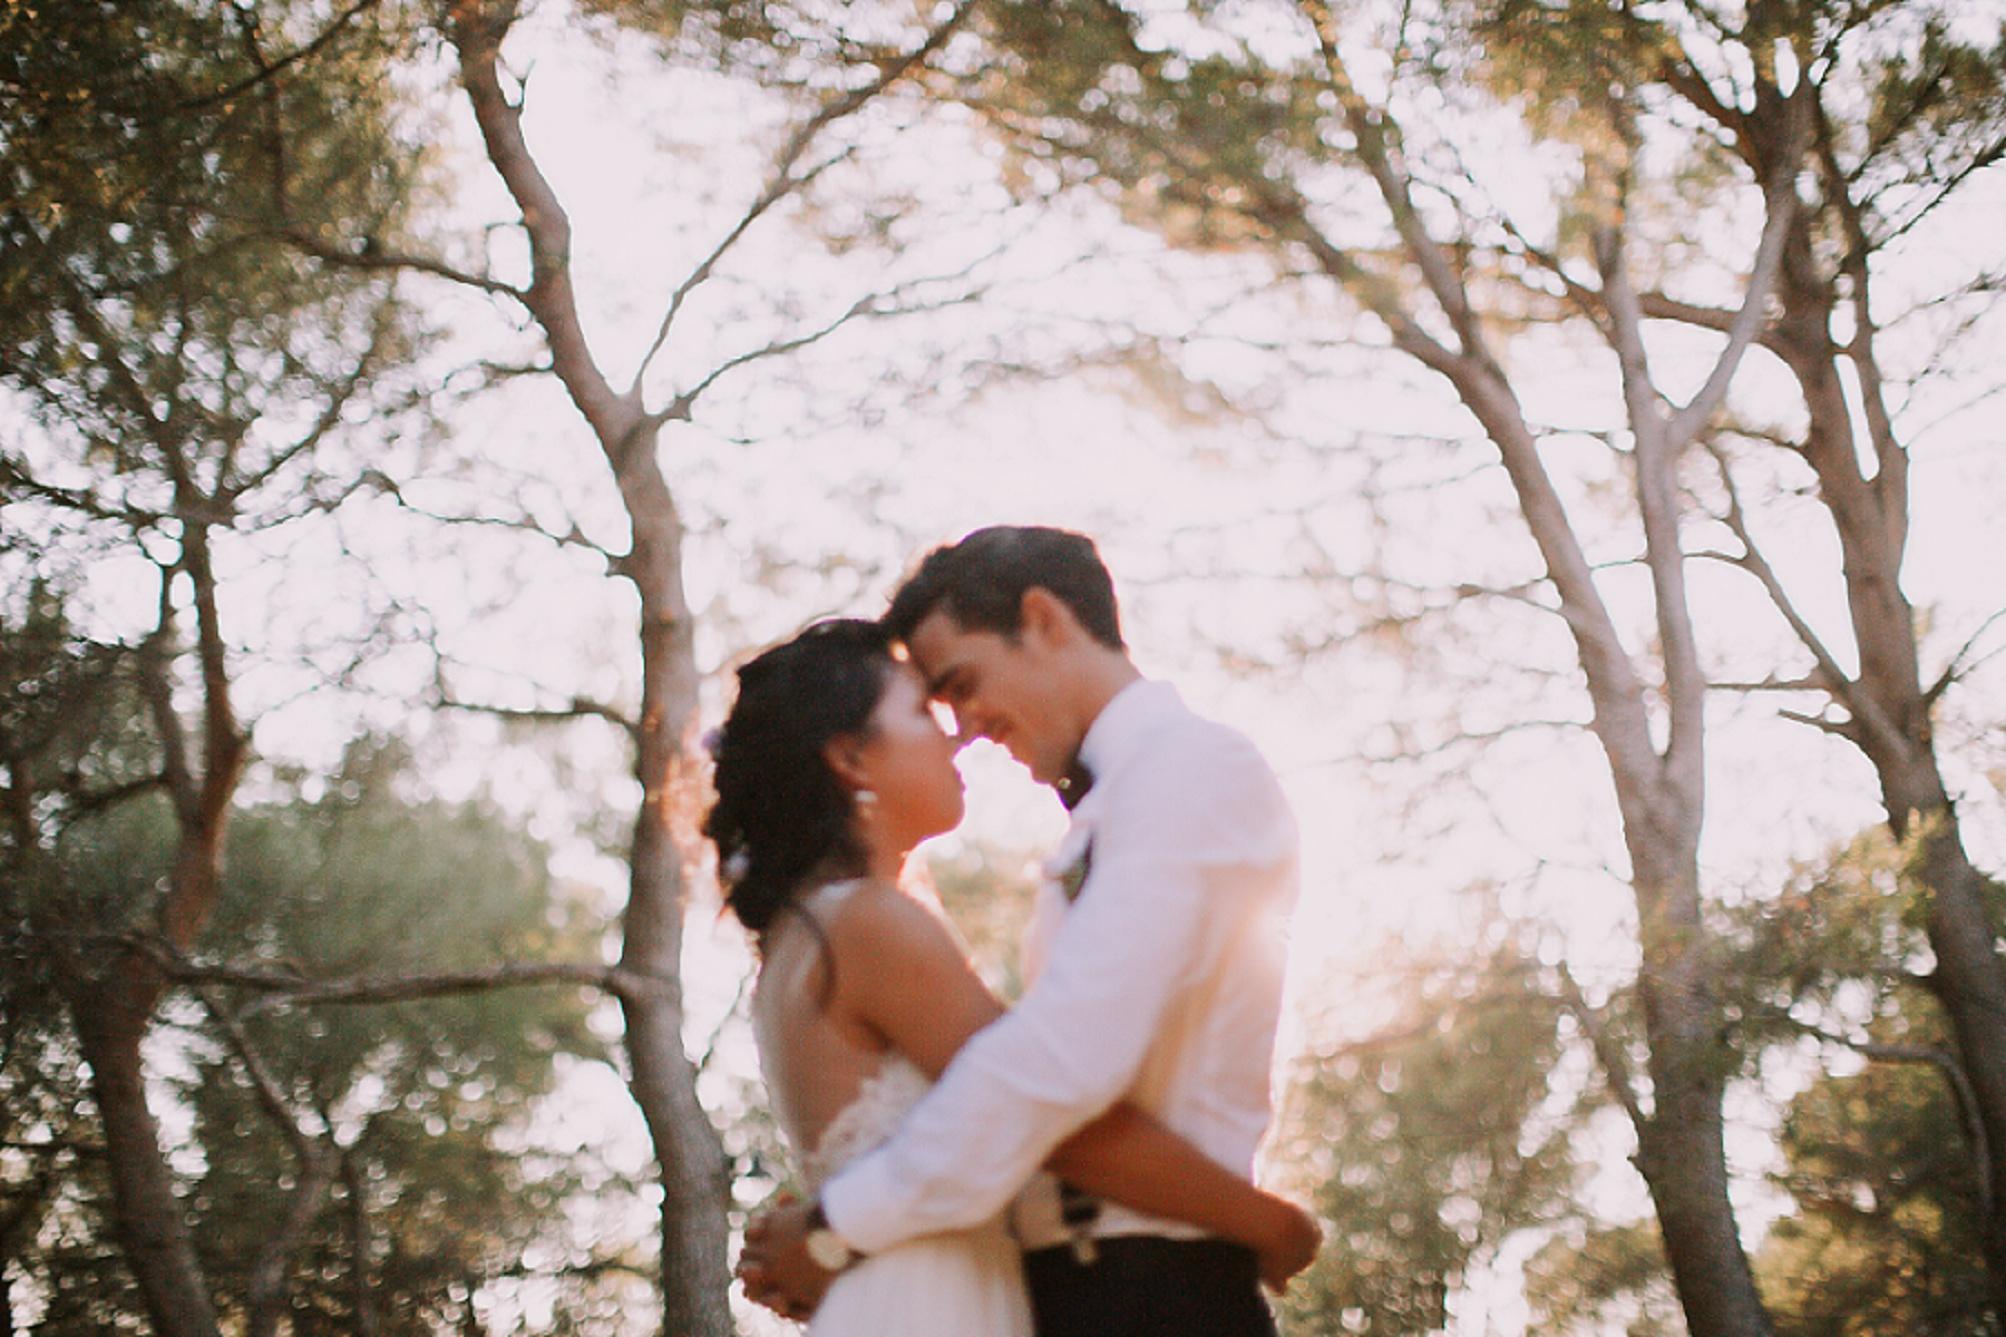 katerynaphotos-mariage-photographe-puyloubier-provence-aix-en-provence-sud-de-la-france_0442.jpg